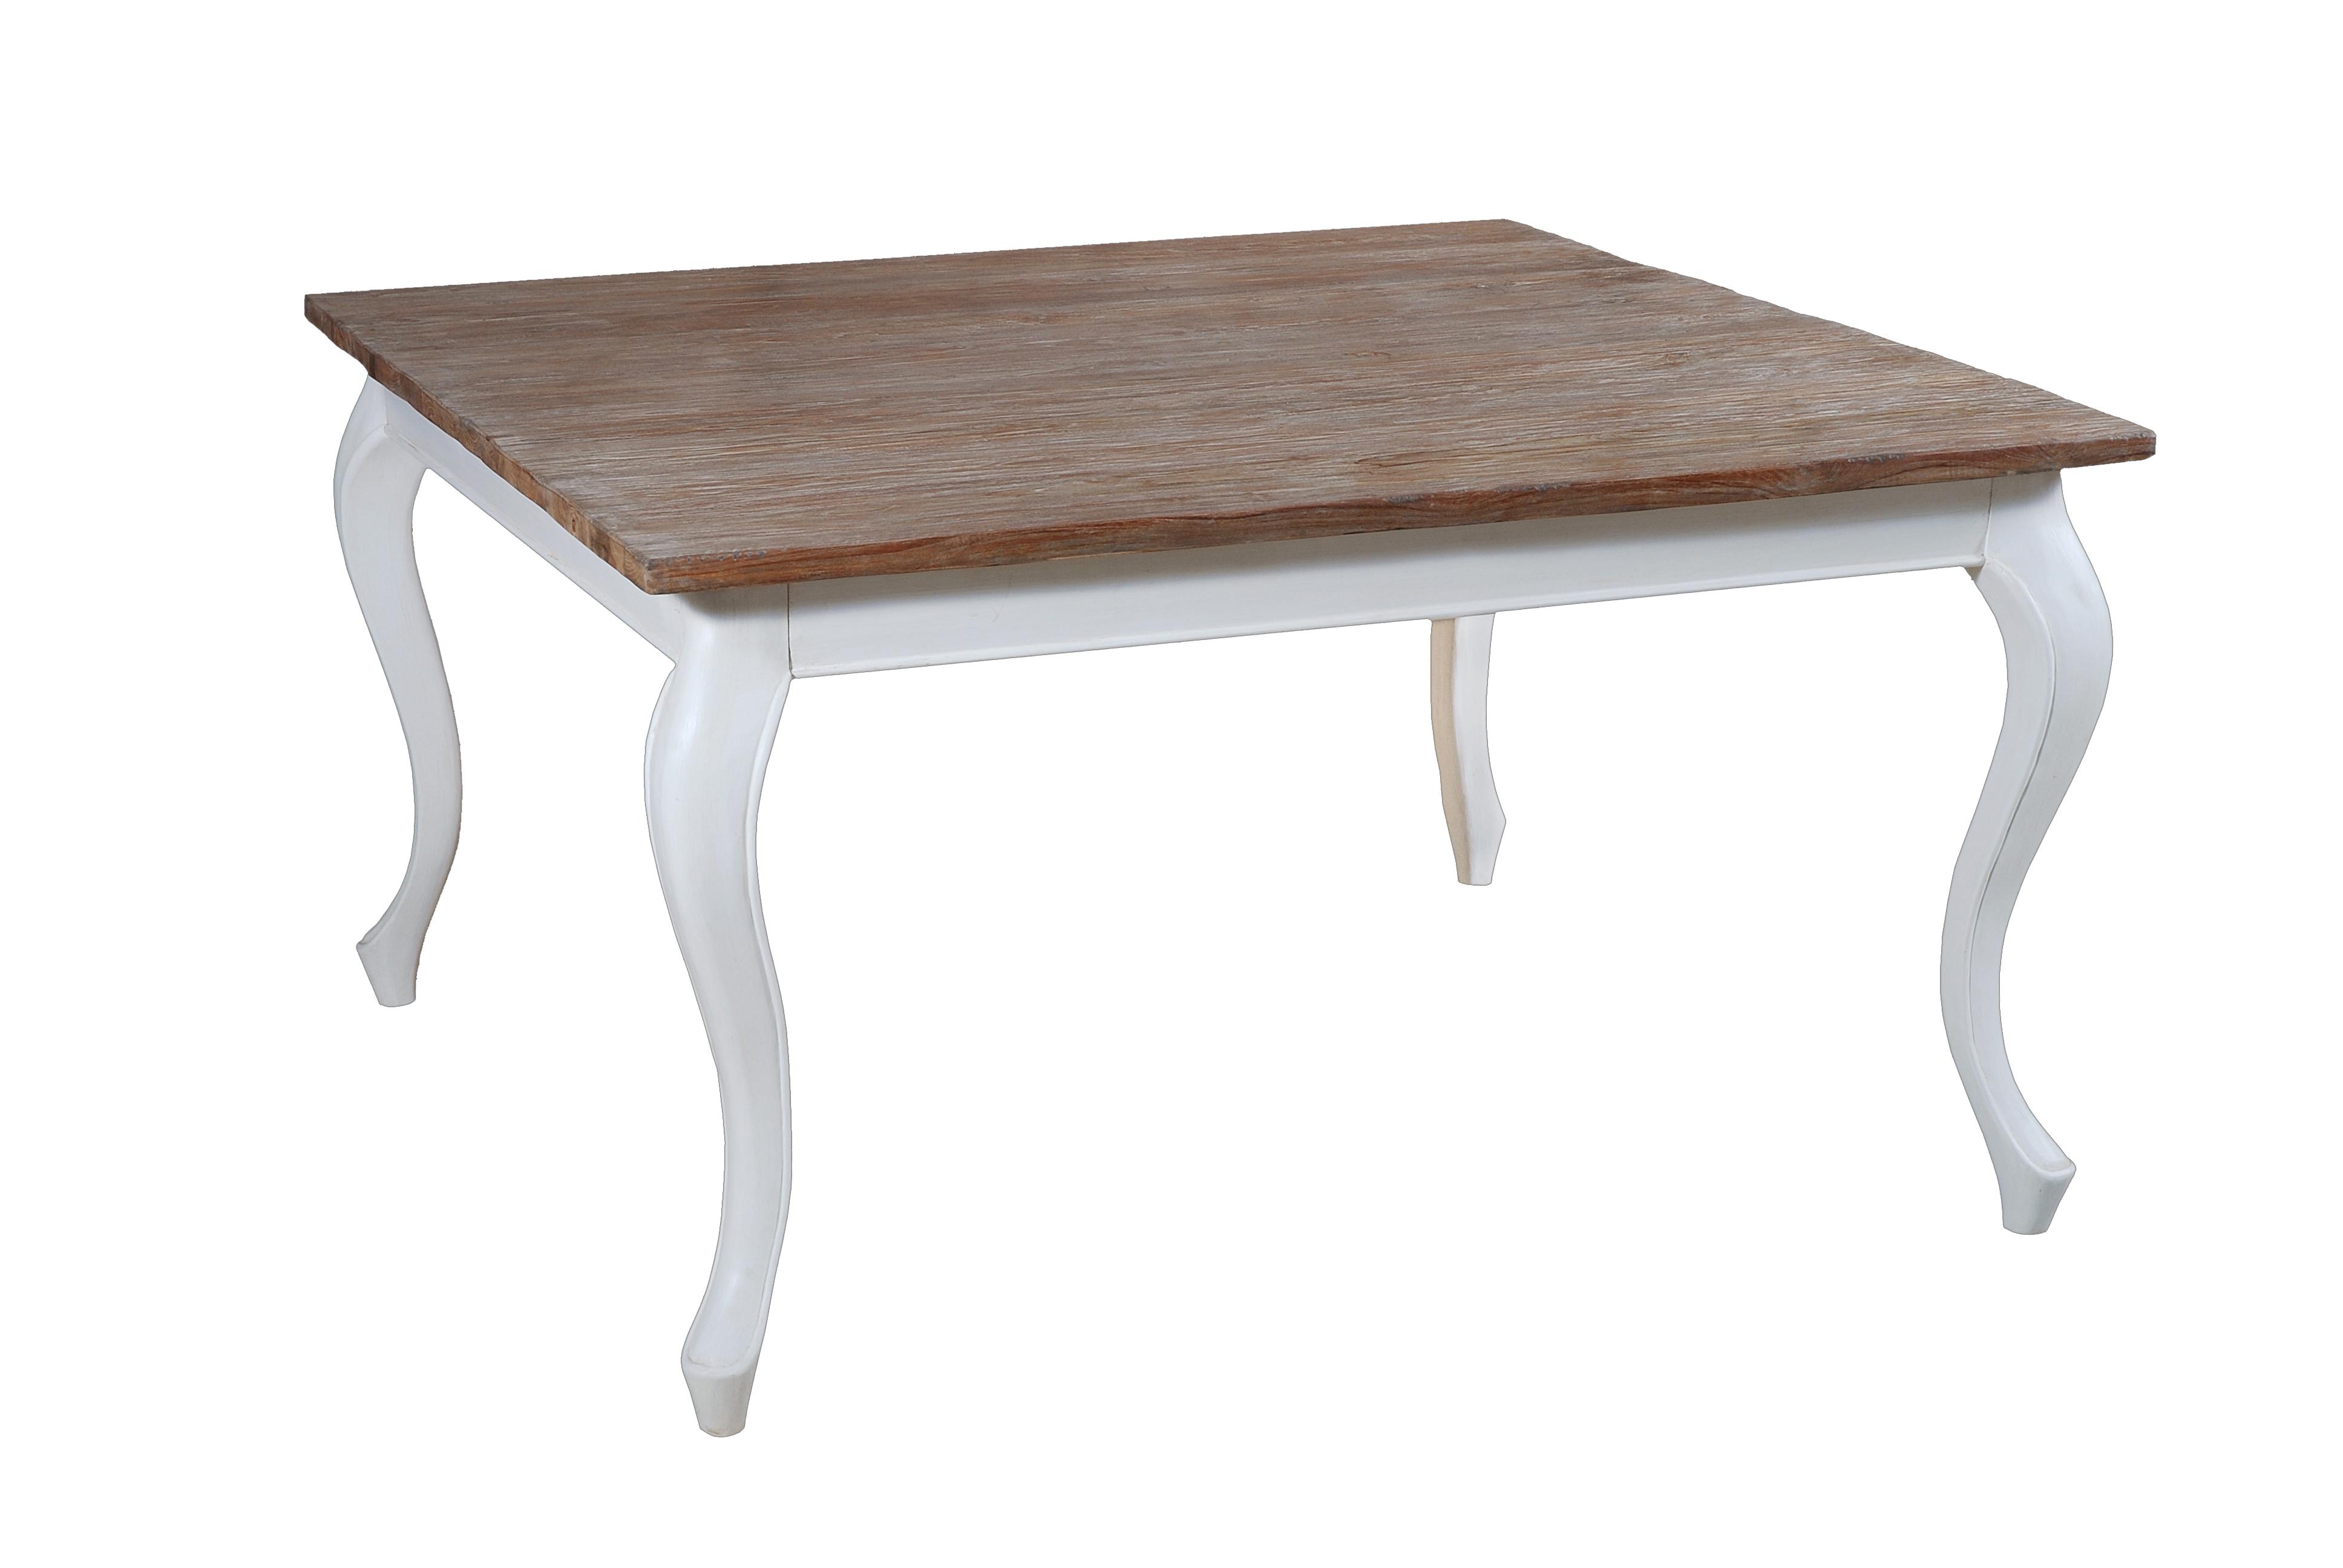 Eettafel White Wash.Vierkante White Wash Eettafel Met Teak Blad En Barokpoten Ajc Meubelen